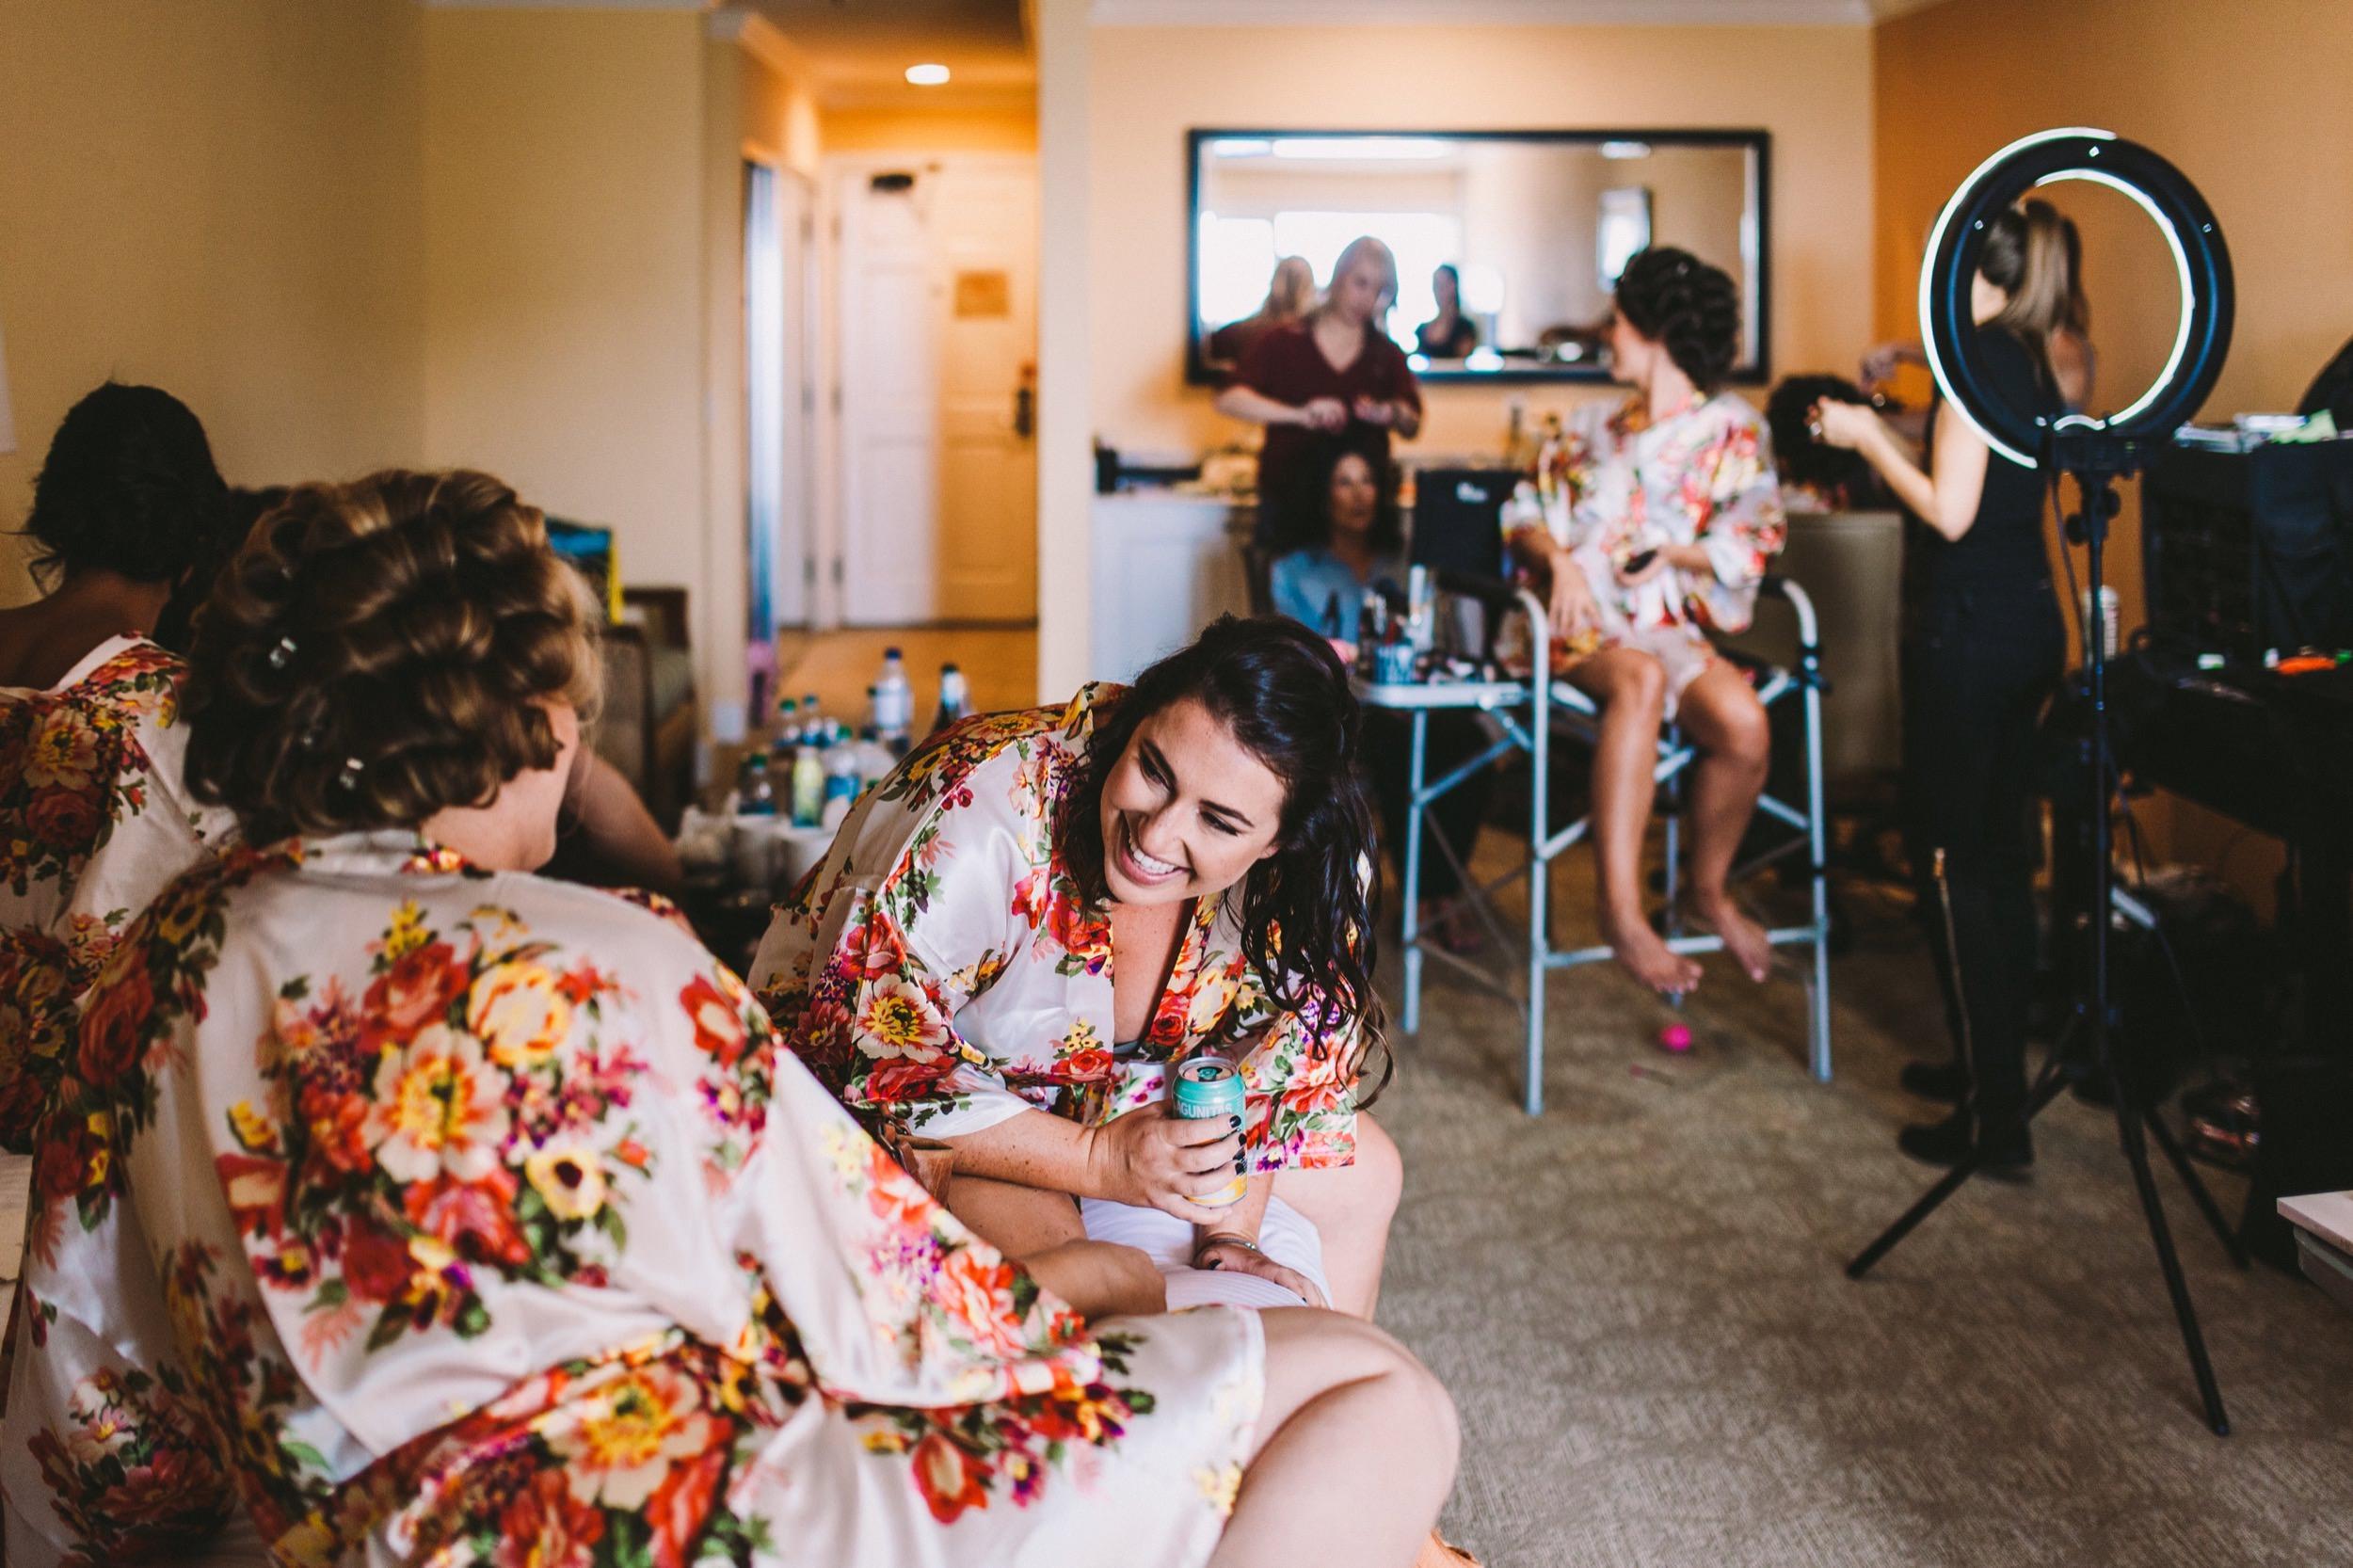 CarlsBad Inn Wedding Prep During the Morning of a Wedding